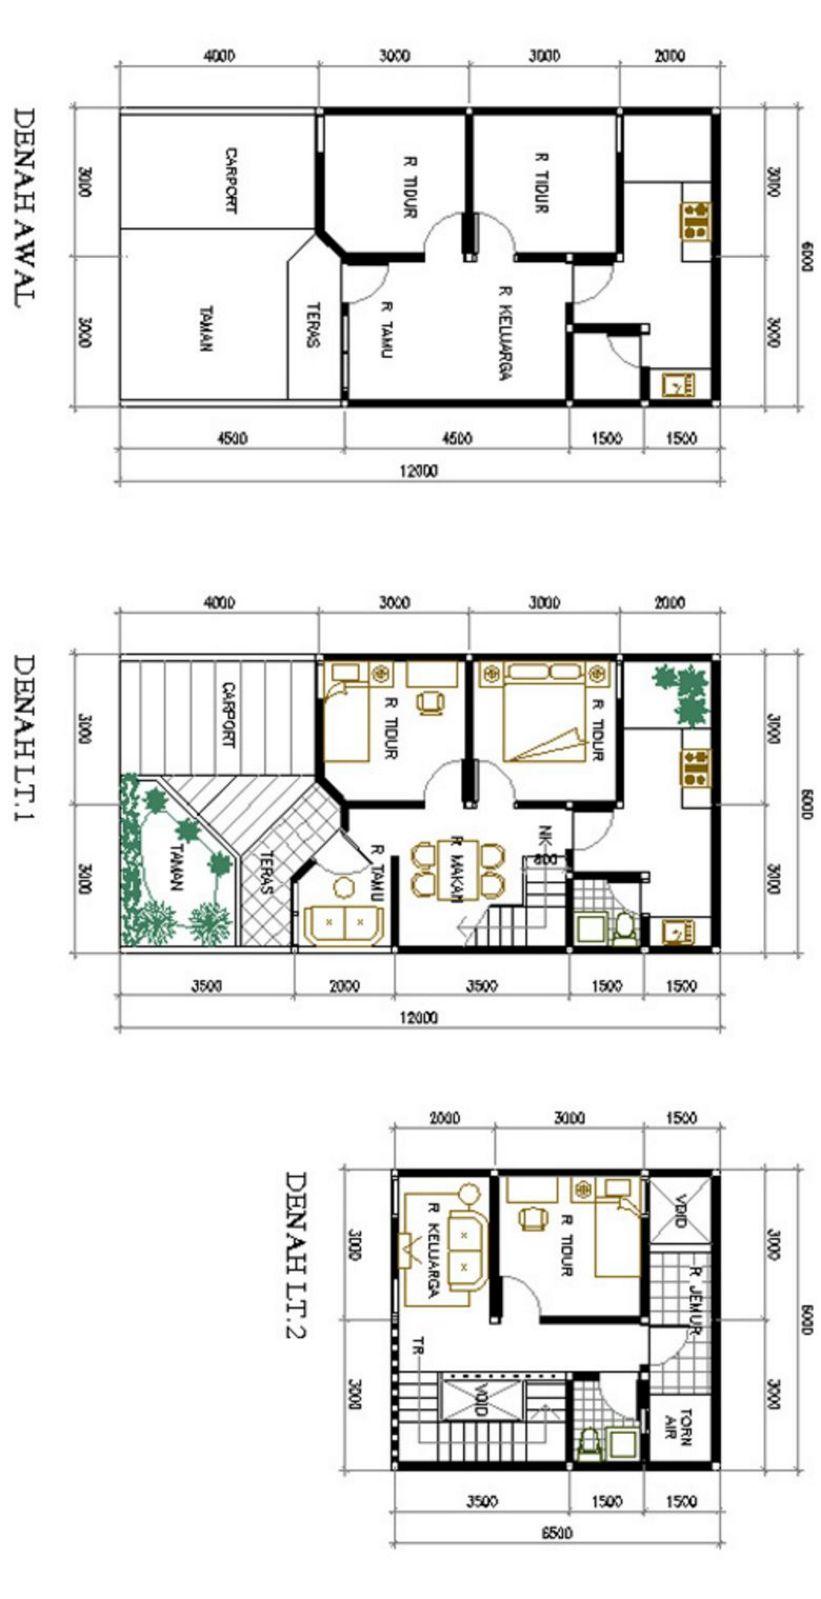 gambar denah 2 lantai 6x12 idaman